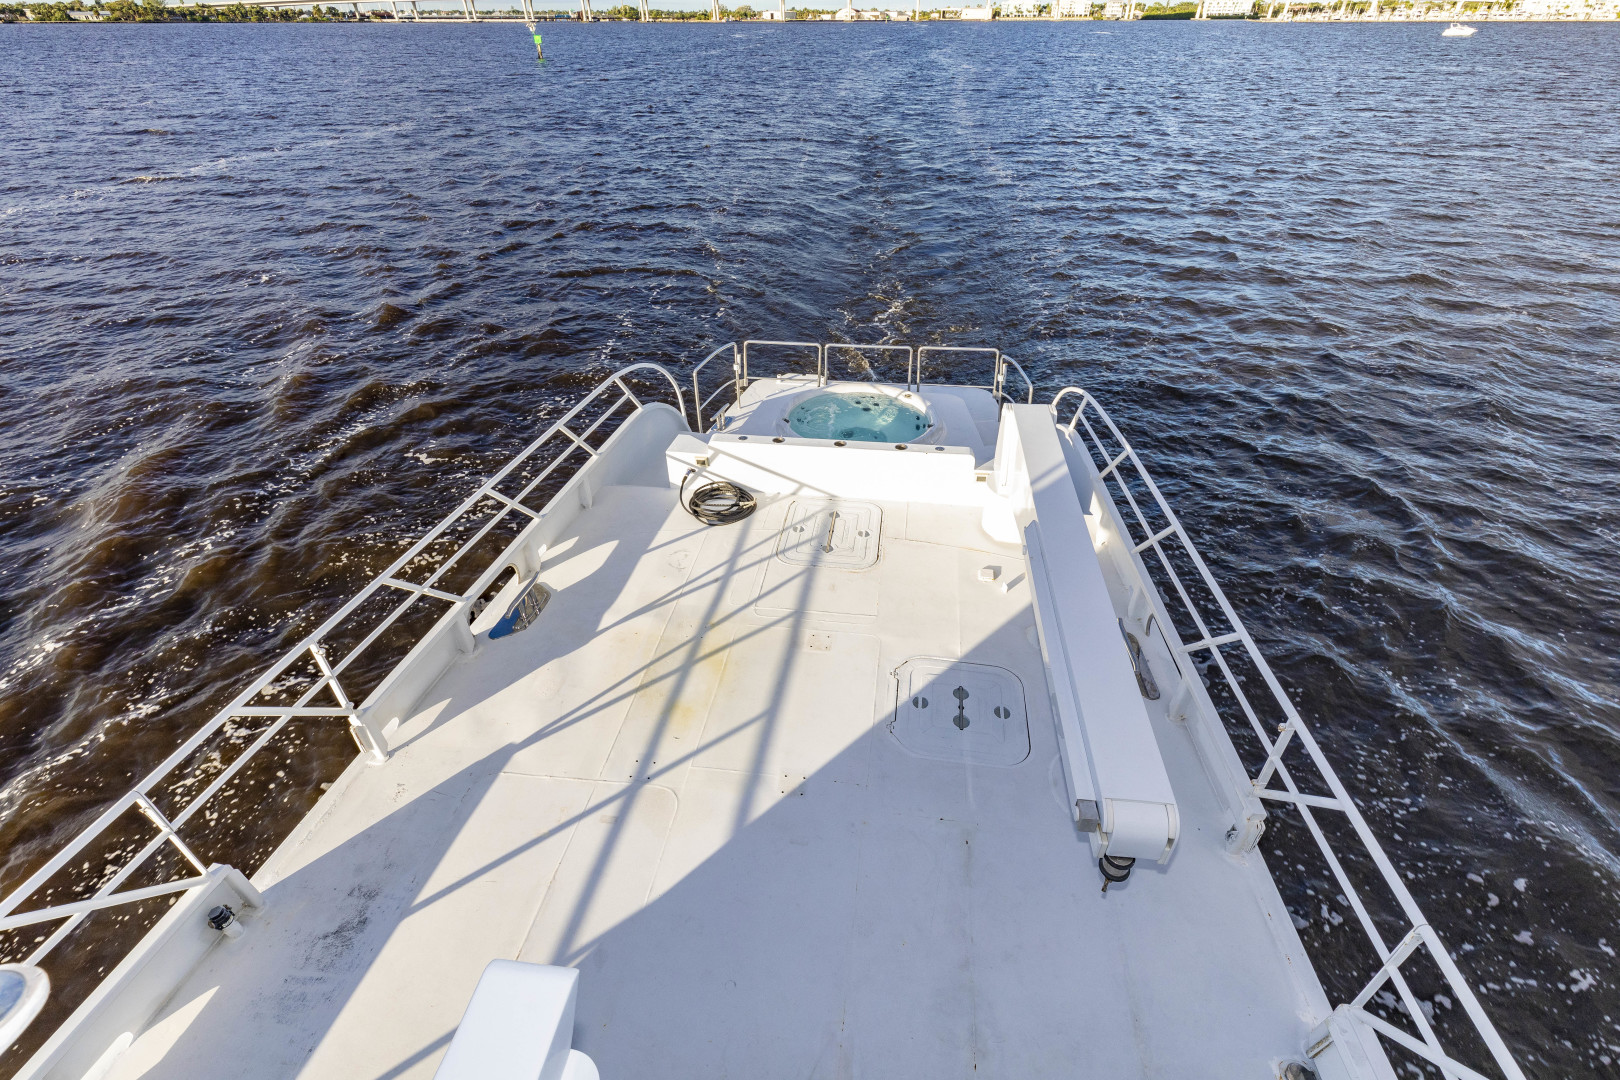 GlassTech-Expedition Yacht 2018-Reset Stuart-Florida-United States-Davit-1568643 | Thumbnail